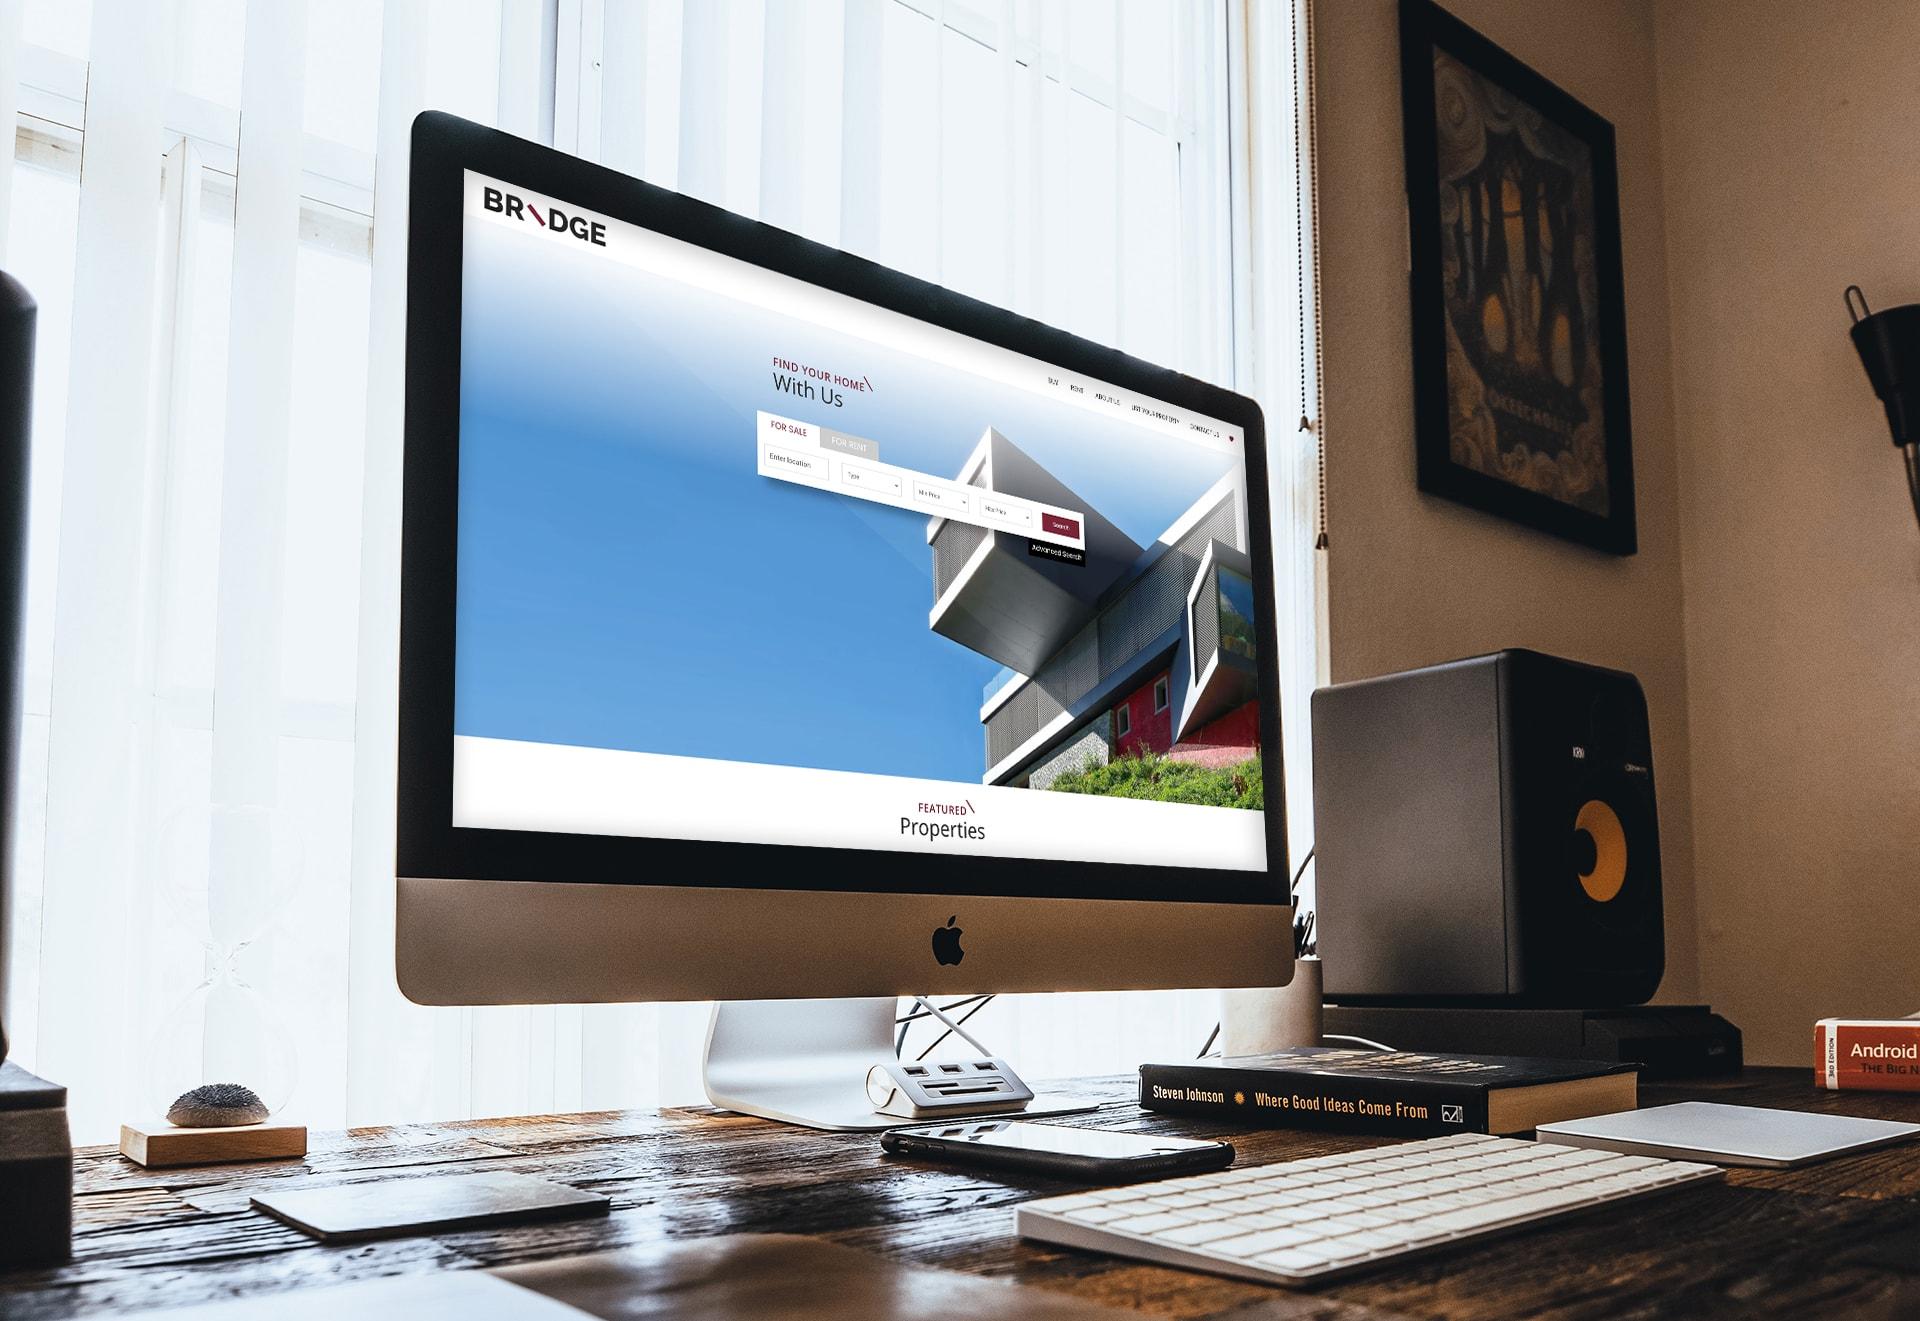 Bridge YourHome real estate website case study